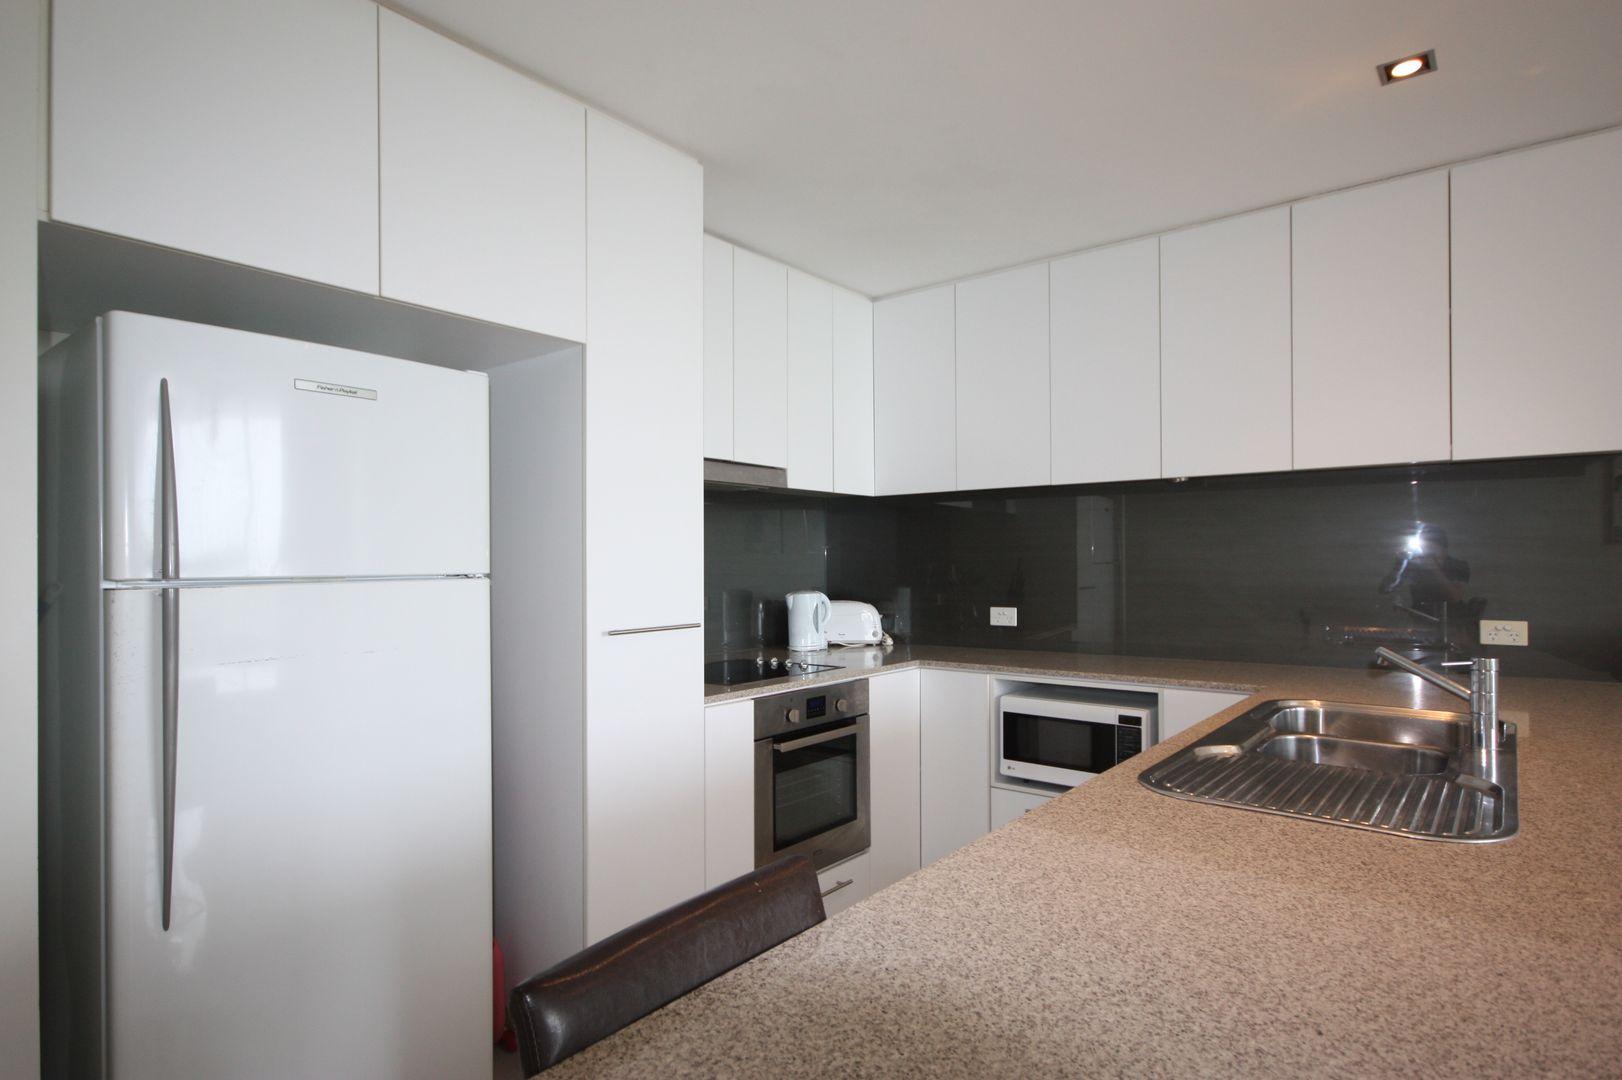 22/26 River Street, Mackay QLD 4740, Image 1